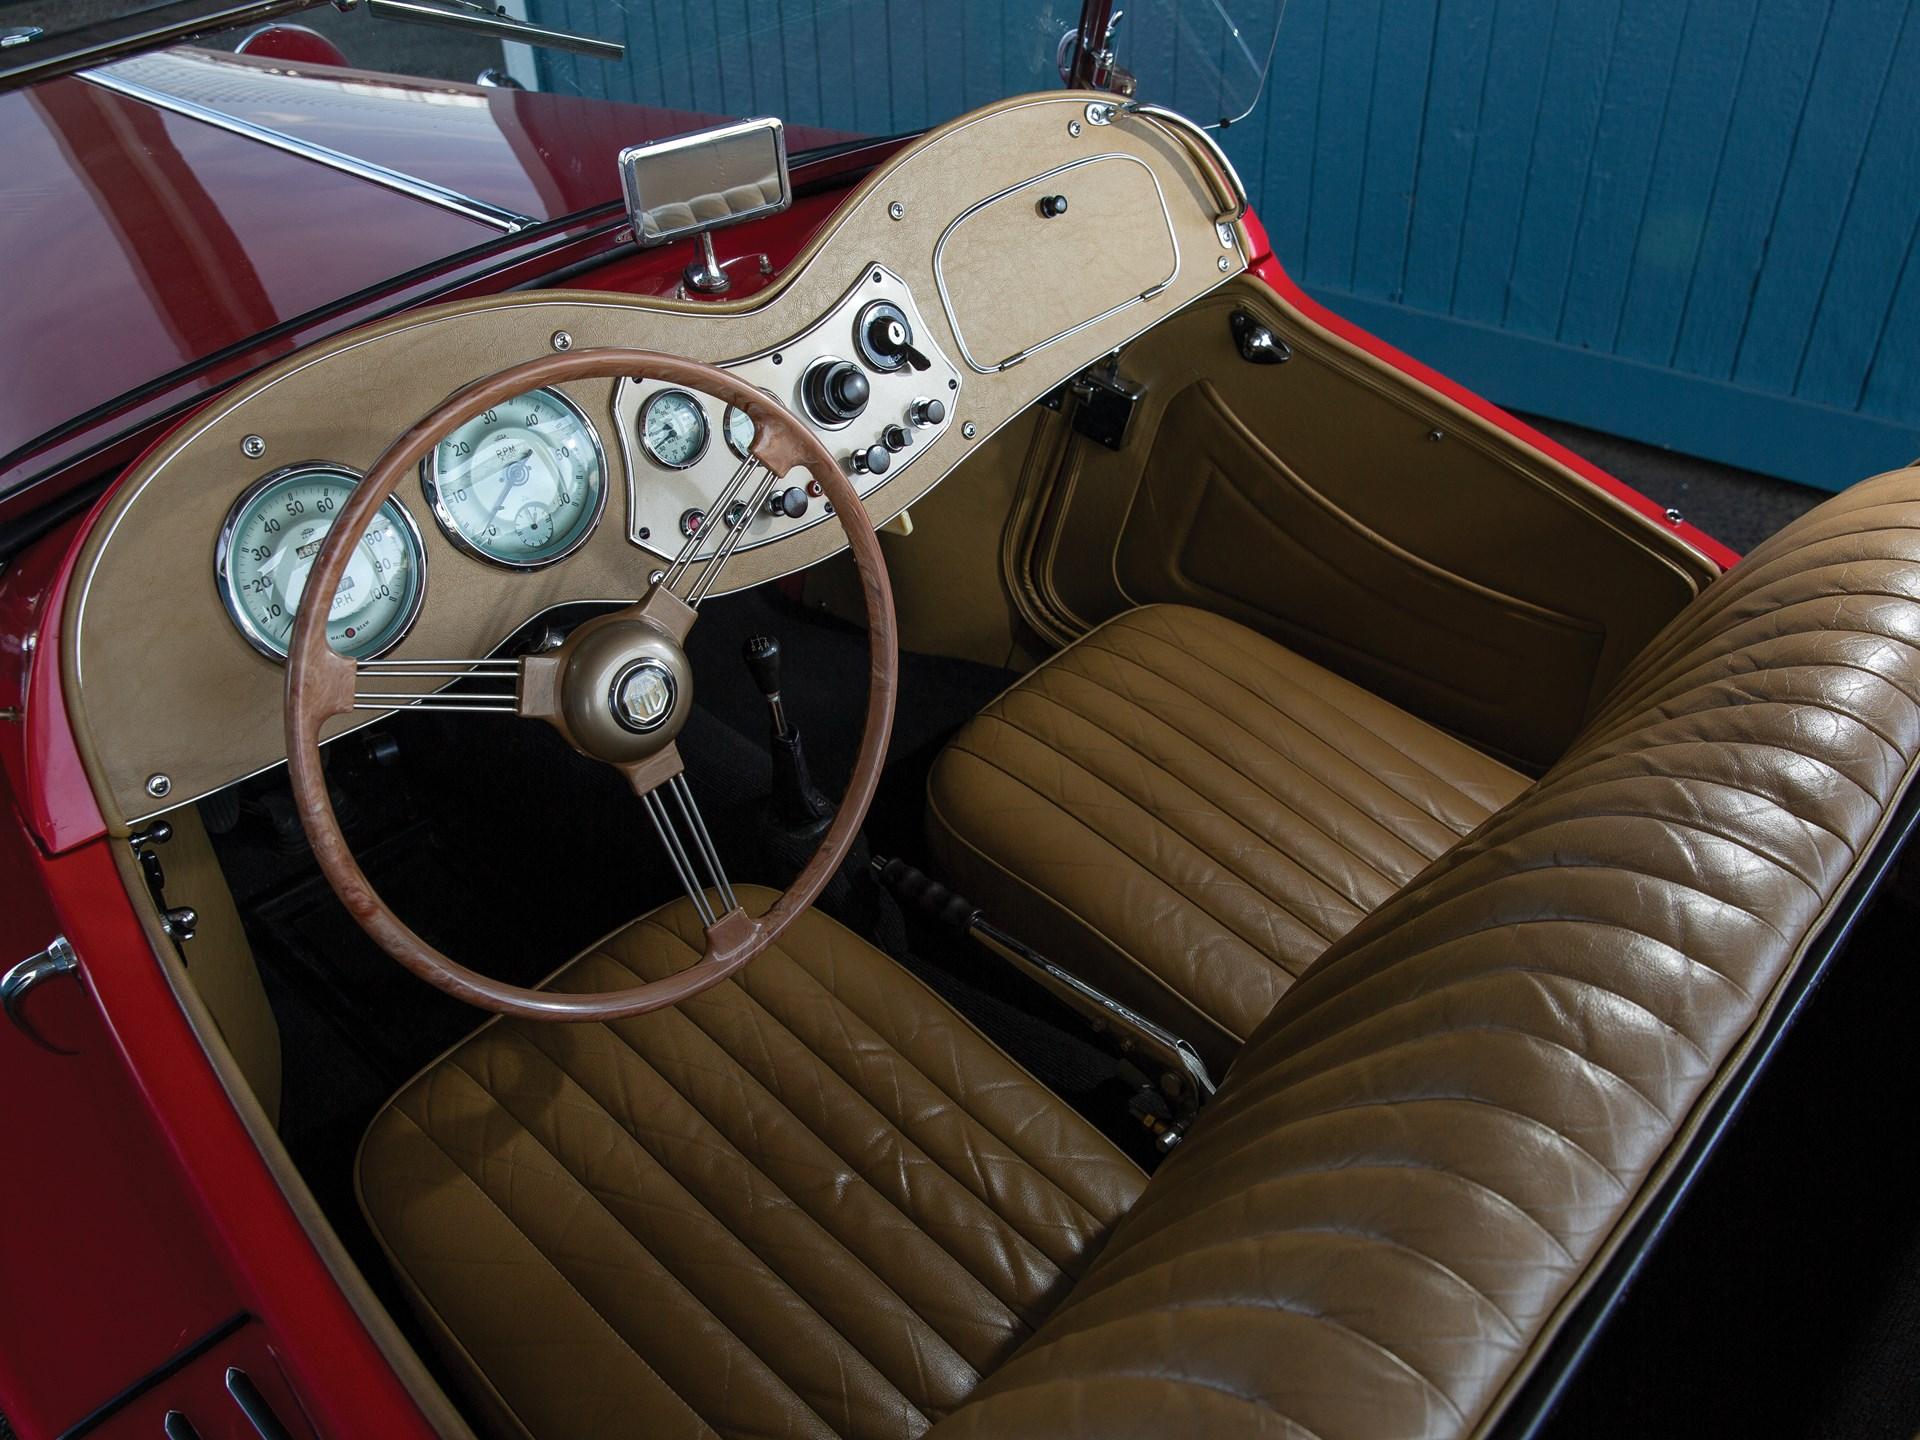 1952 MG TD interior seats